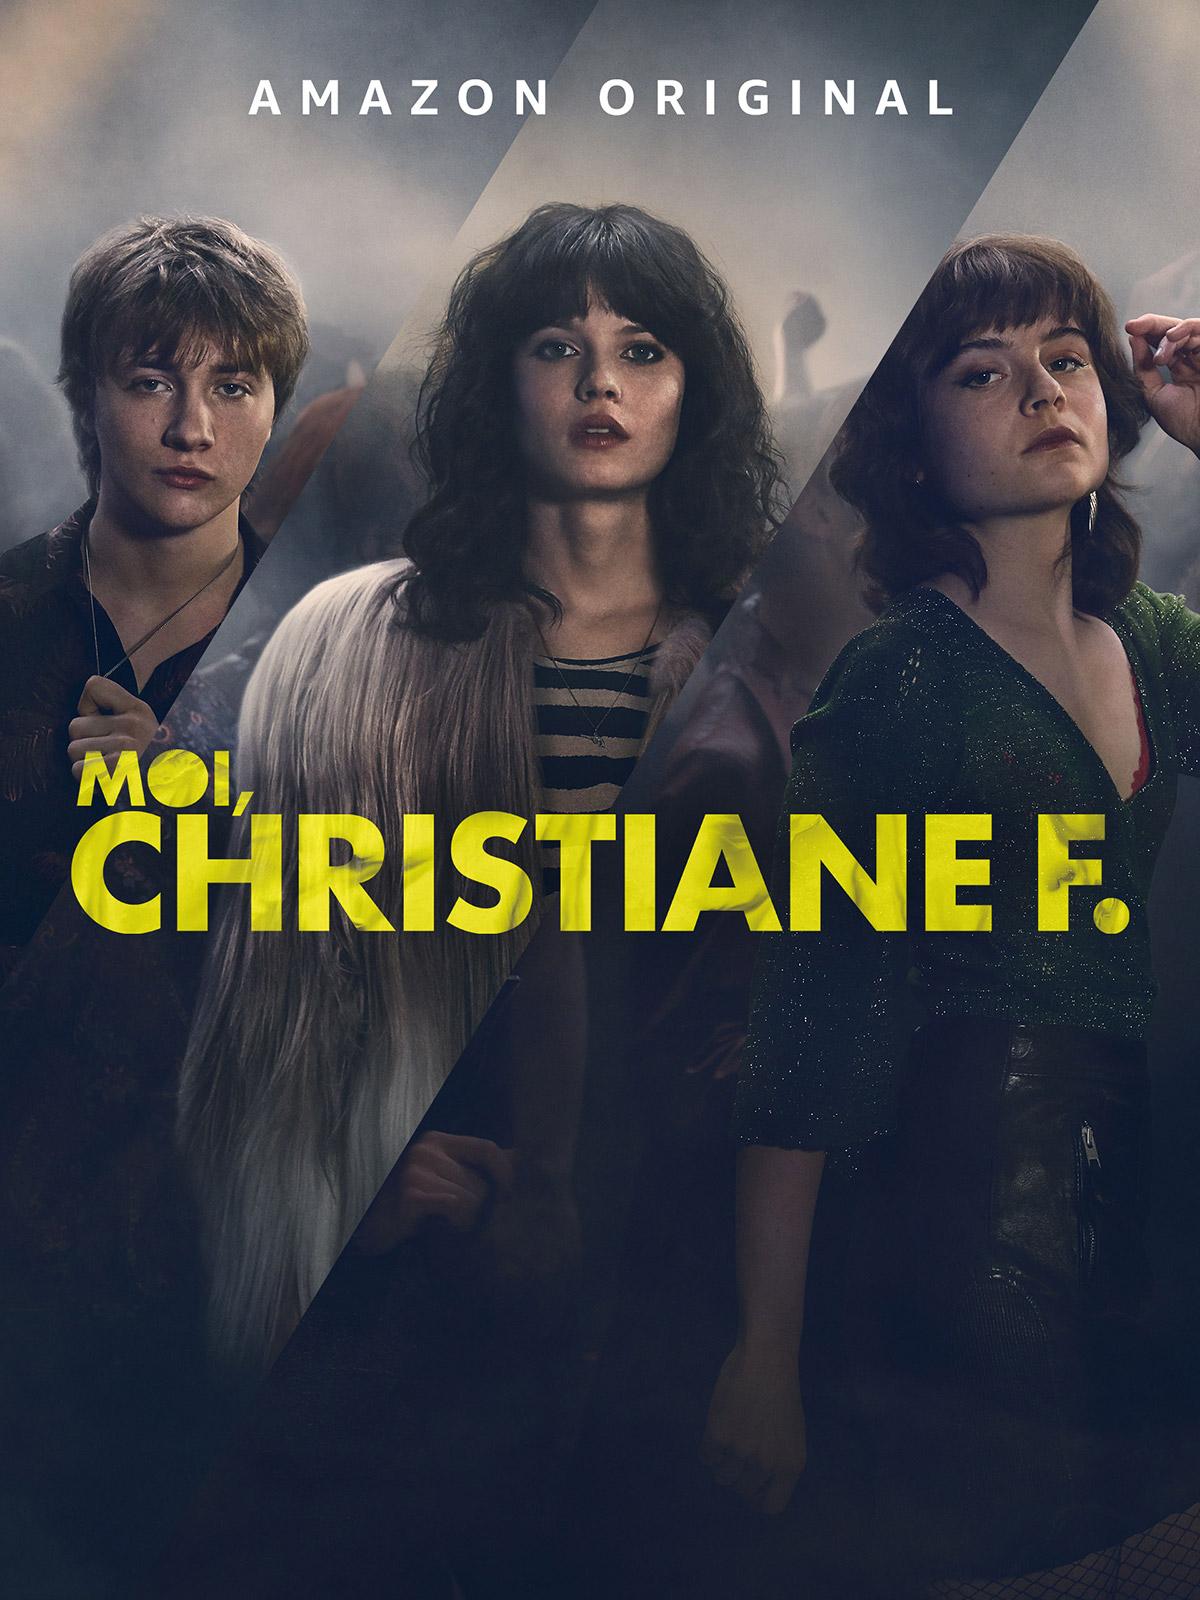 13 - Moi, Christiane F.